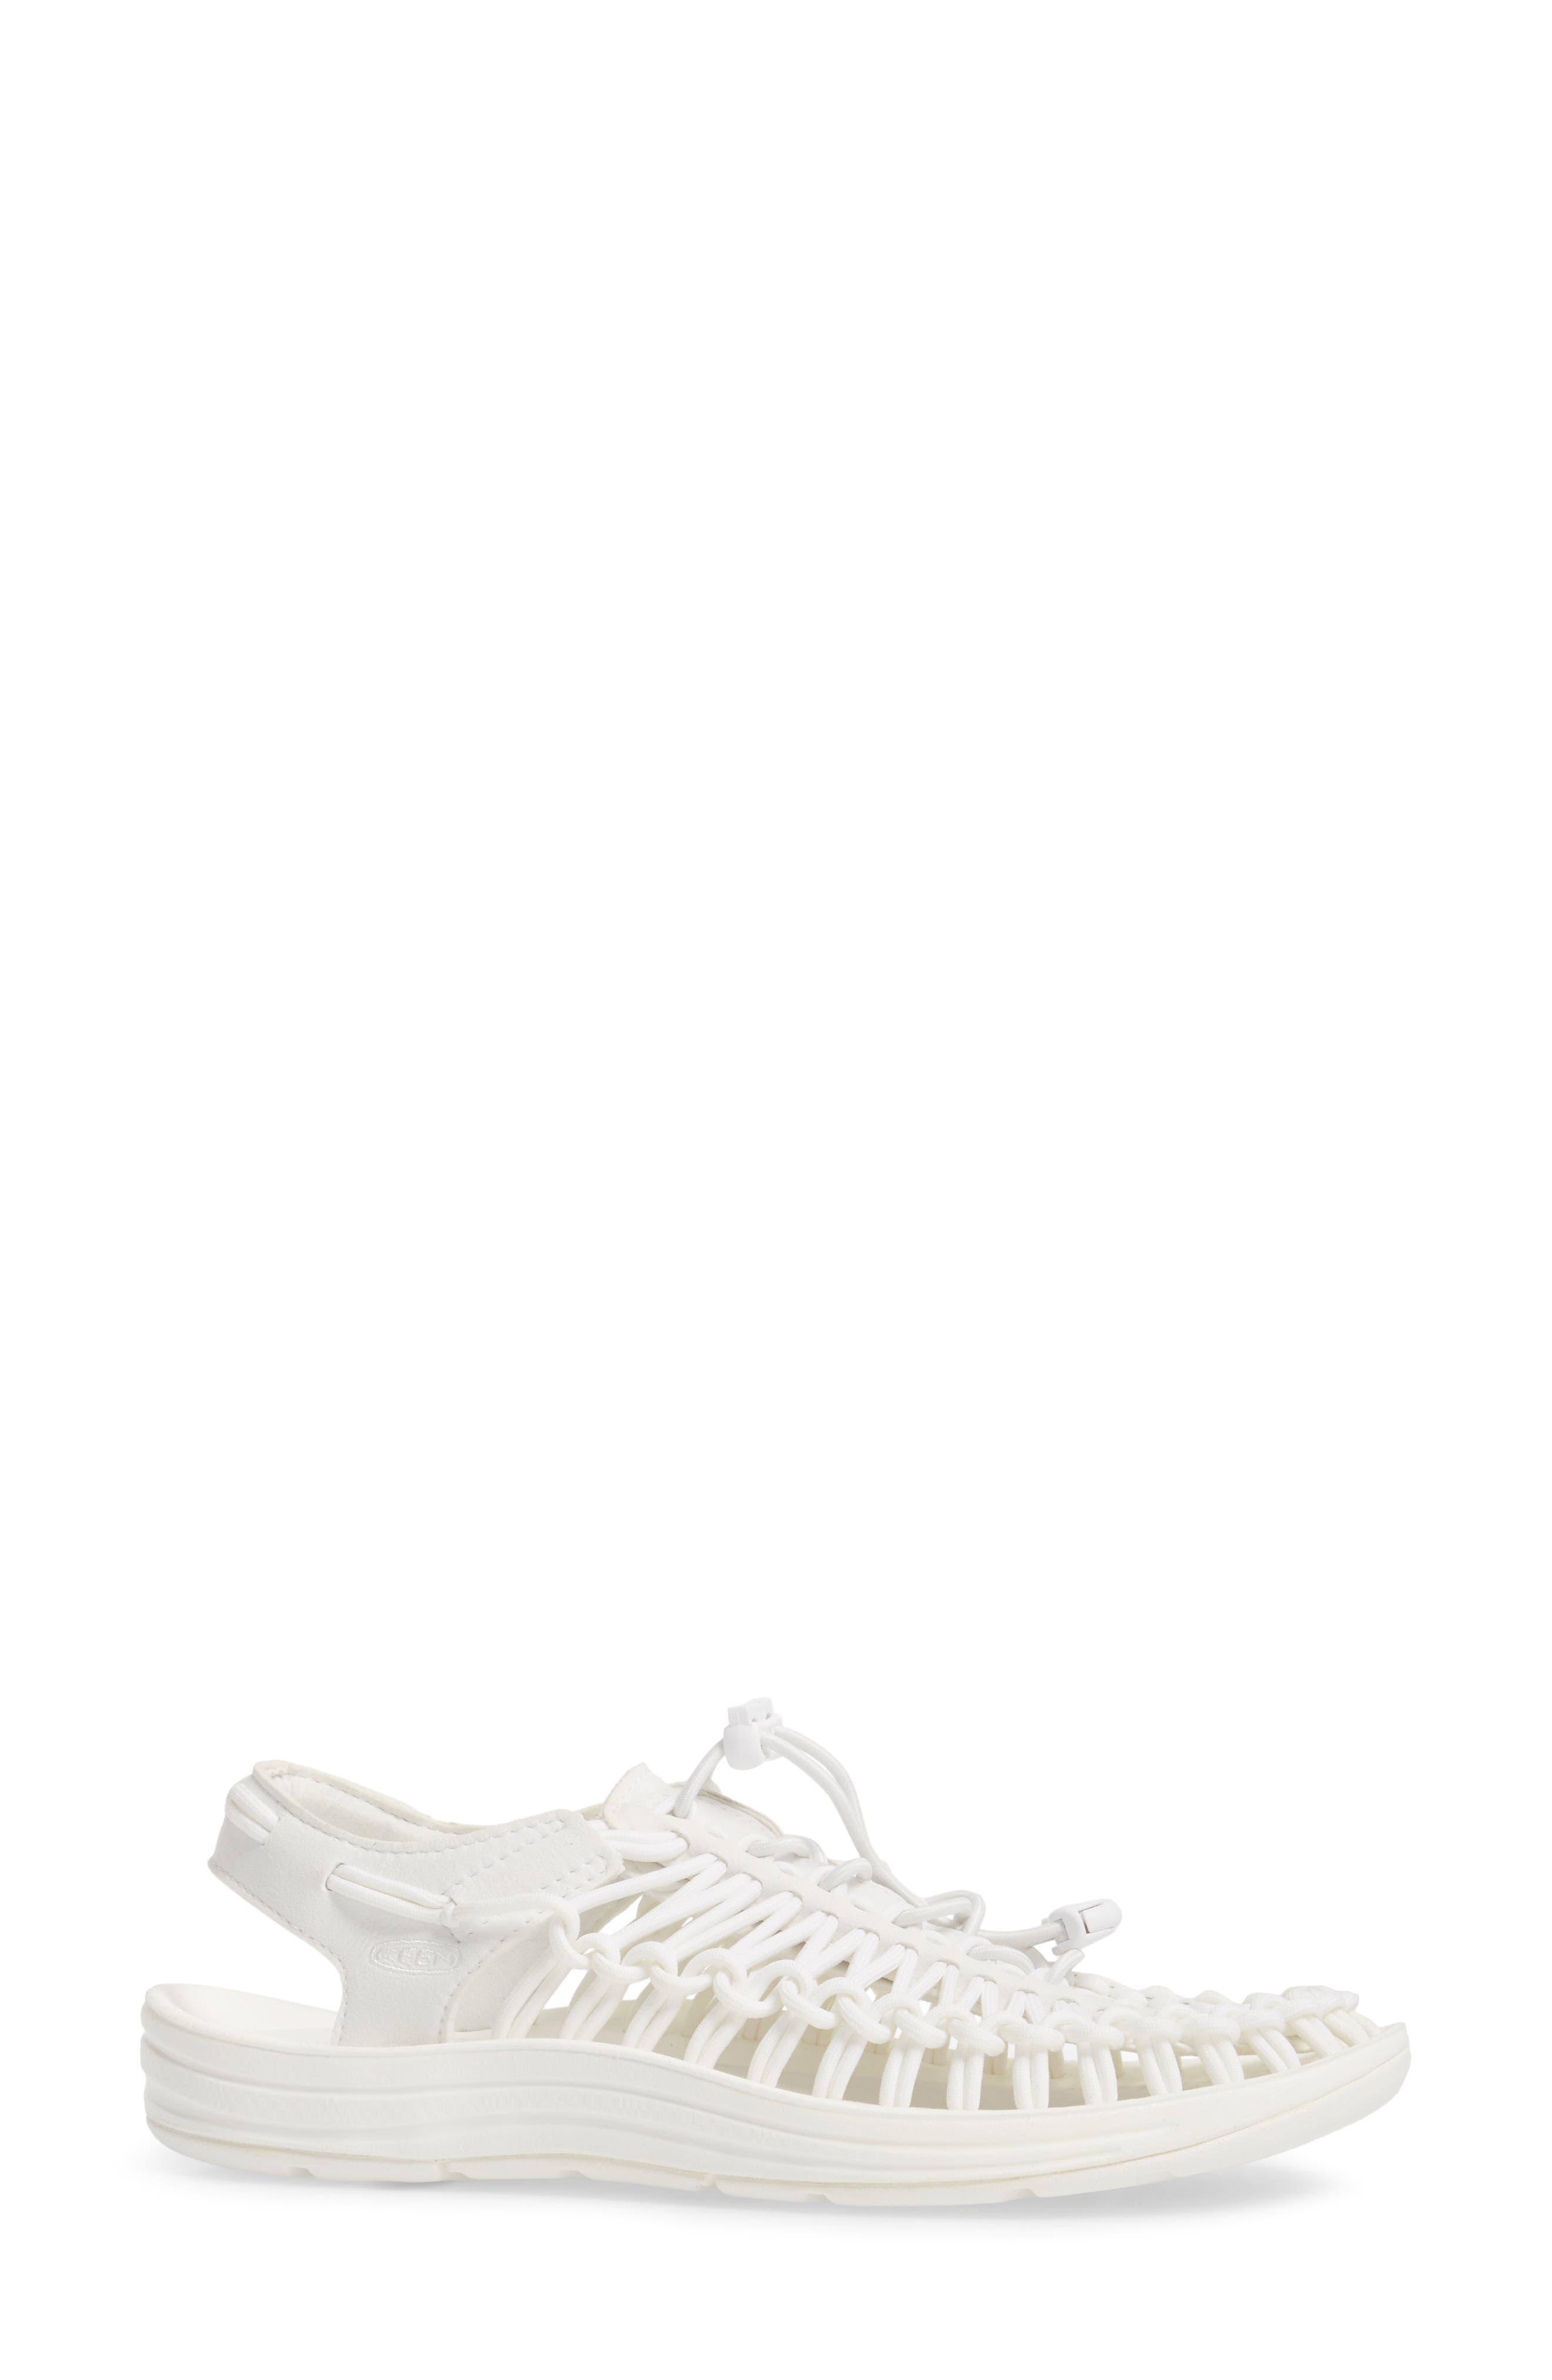 'Uneek' Water Sneaker,                             Alternate thumbnail 3, color,                             Star White